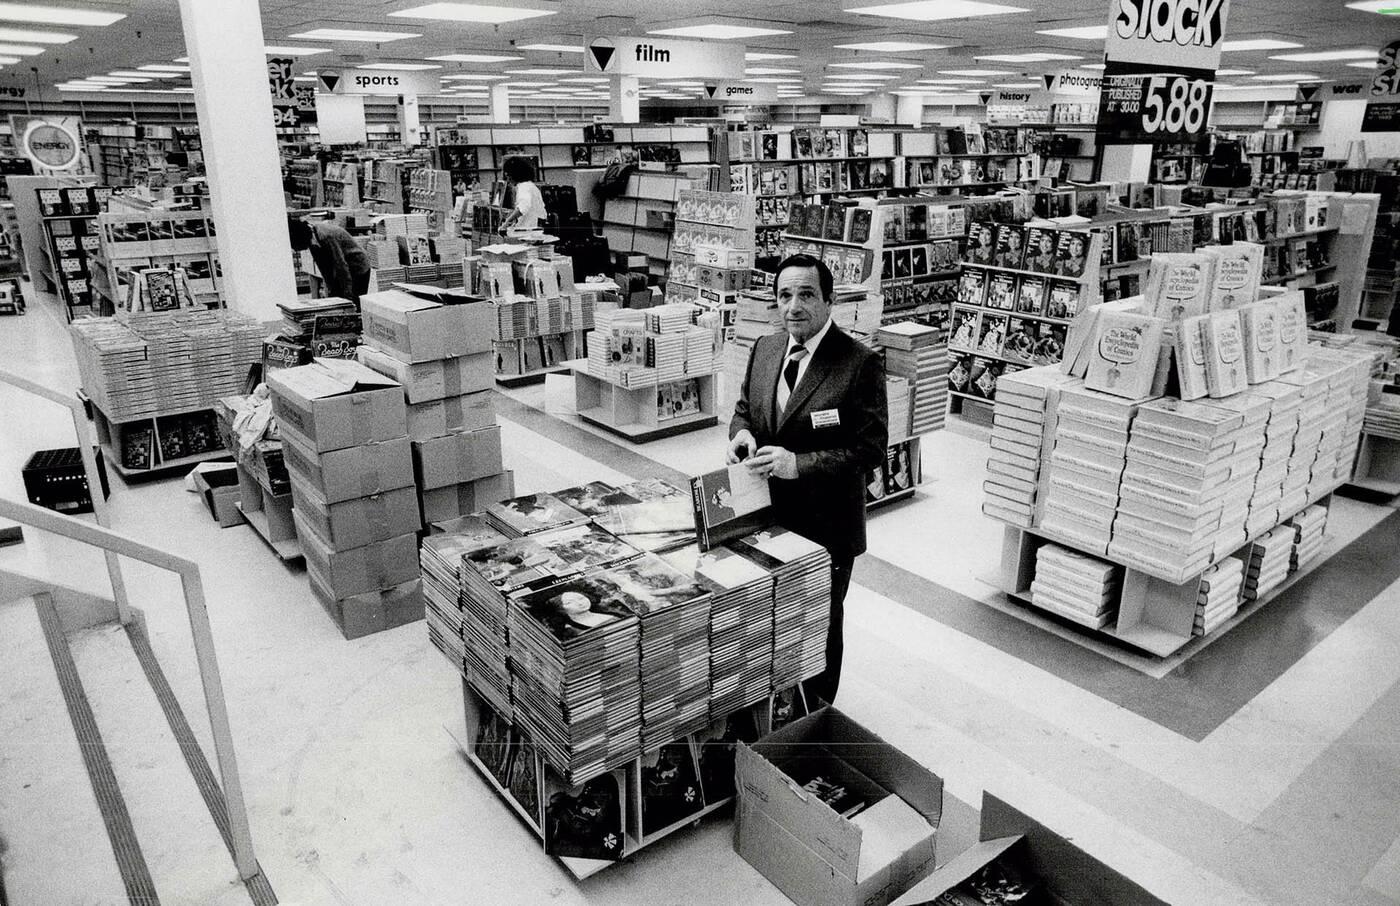 worlds biggest bookstore